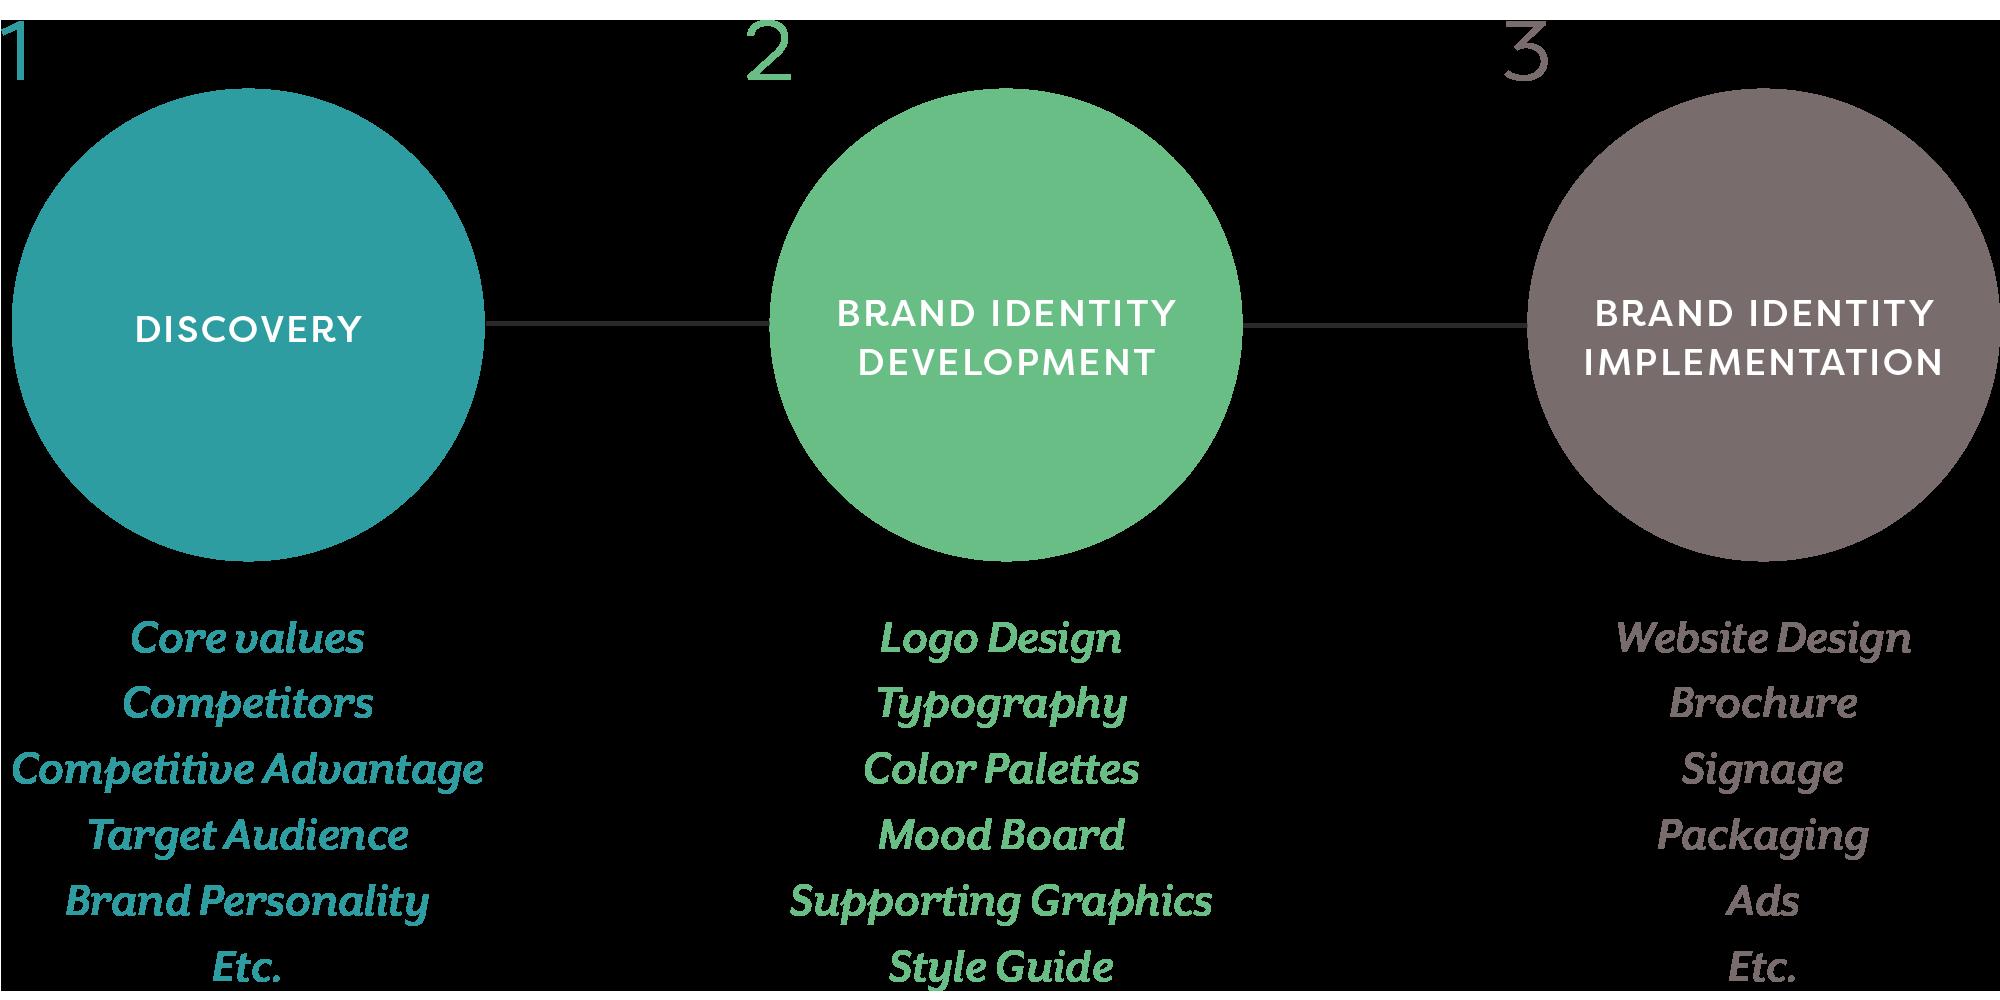 Brand identity process chart graphic